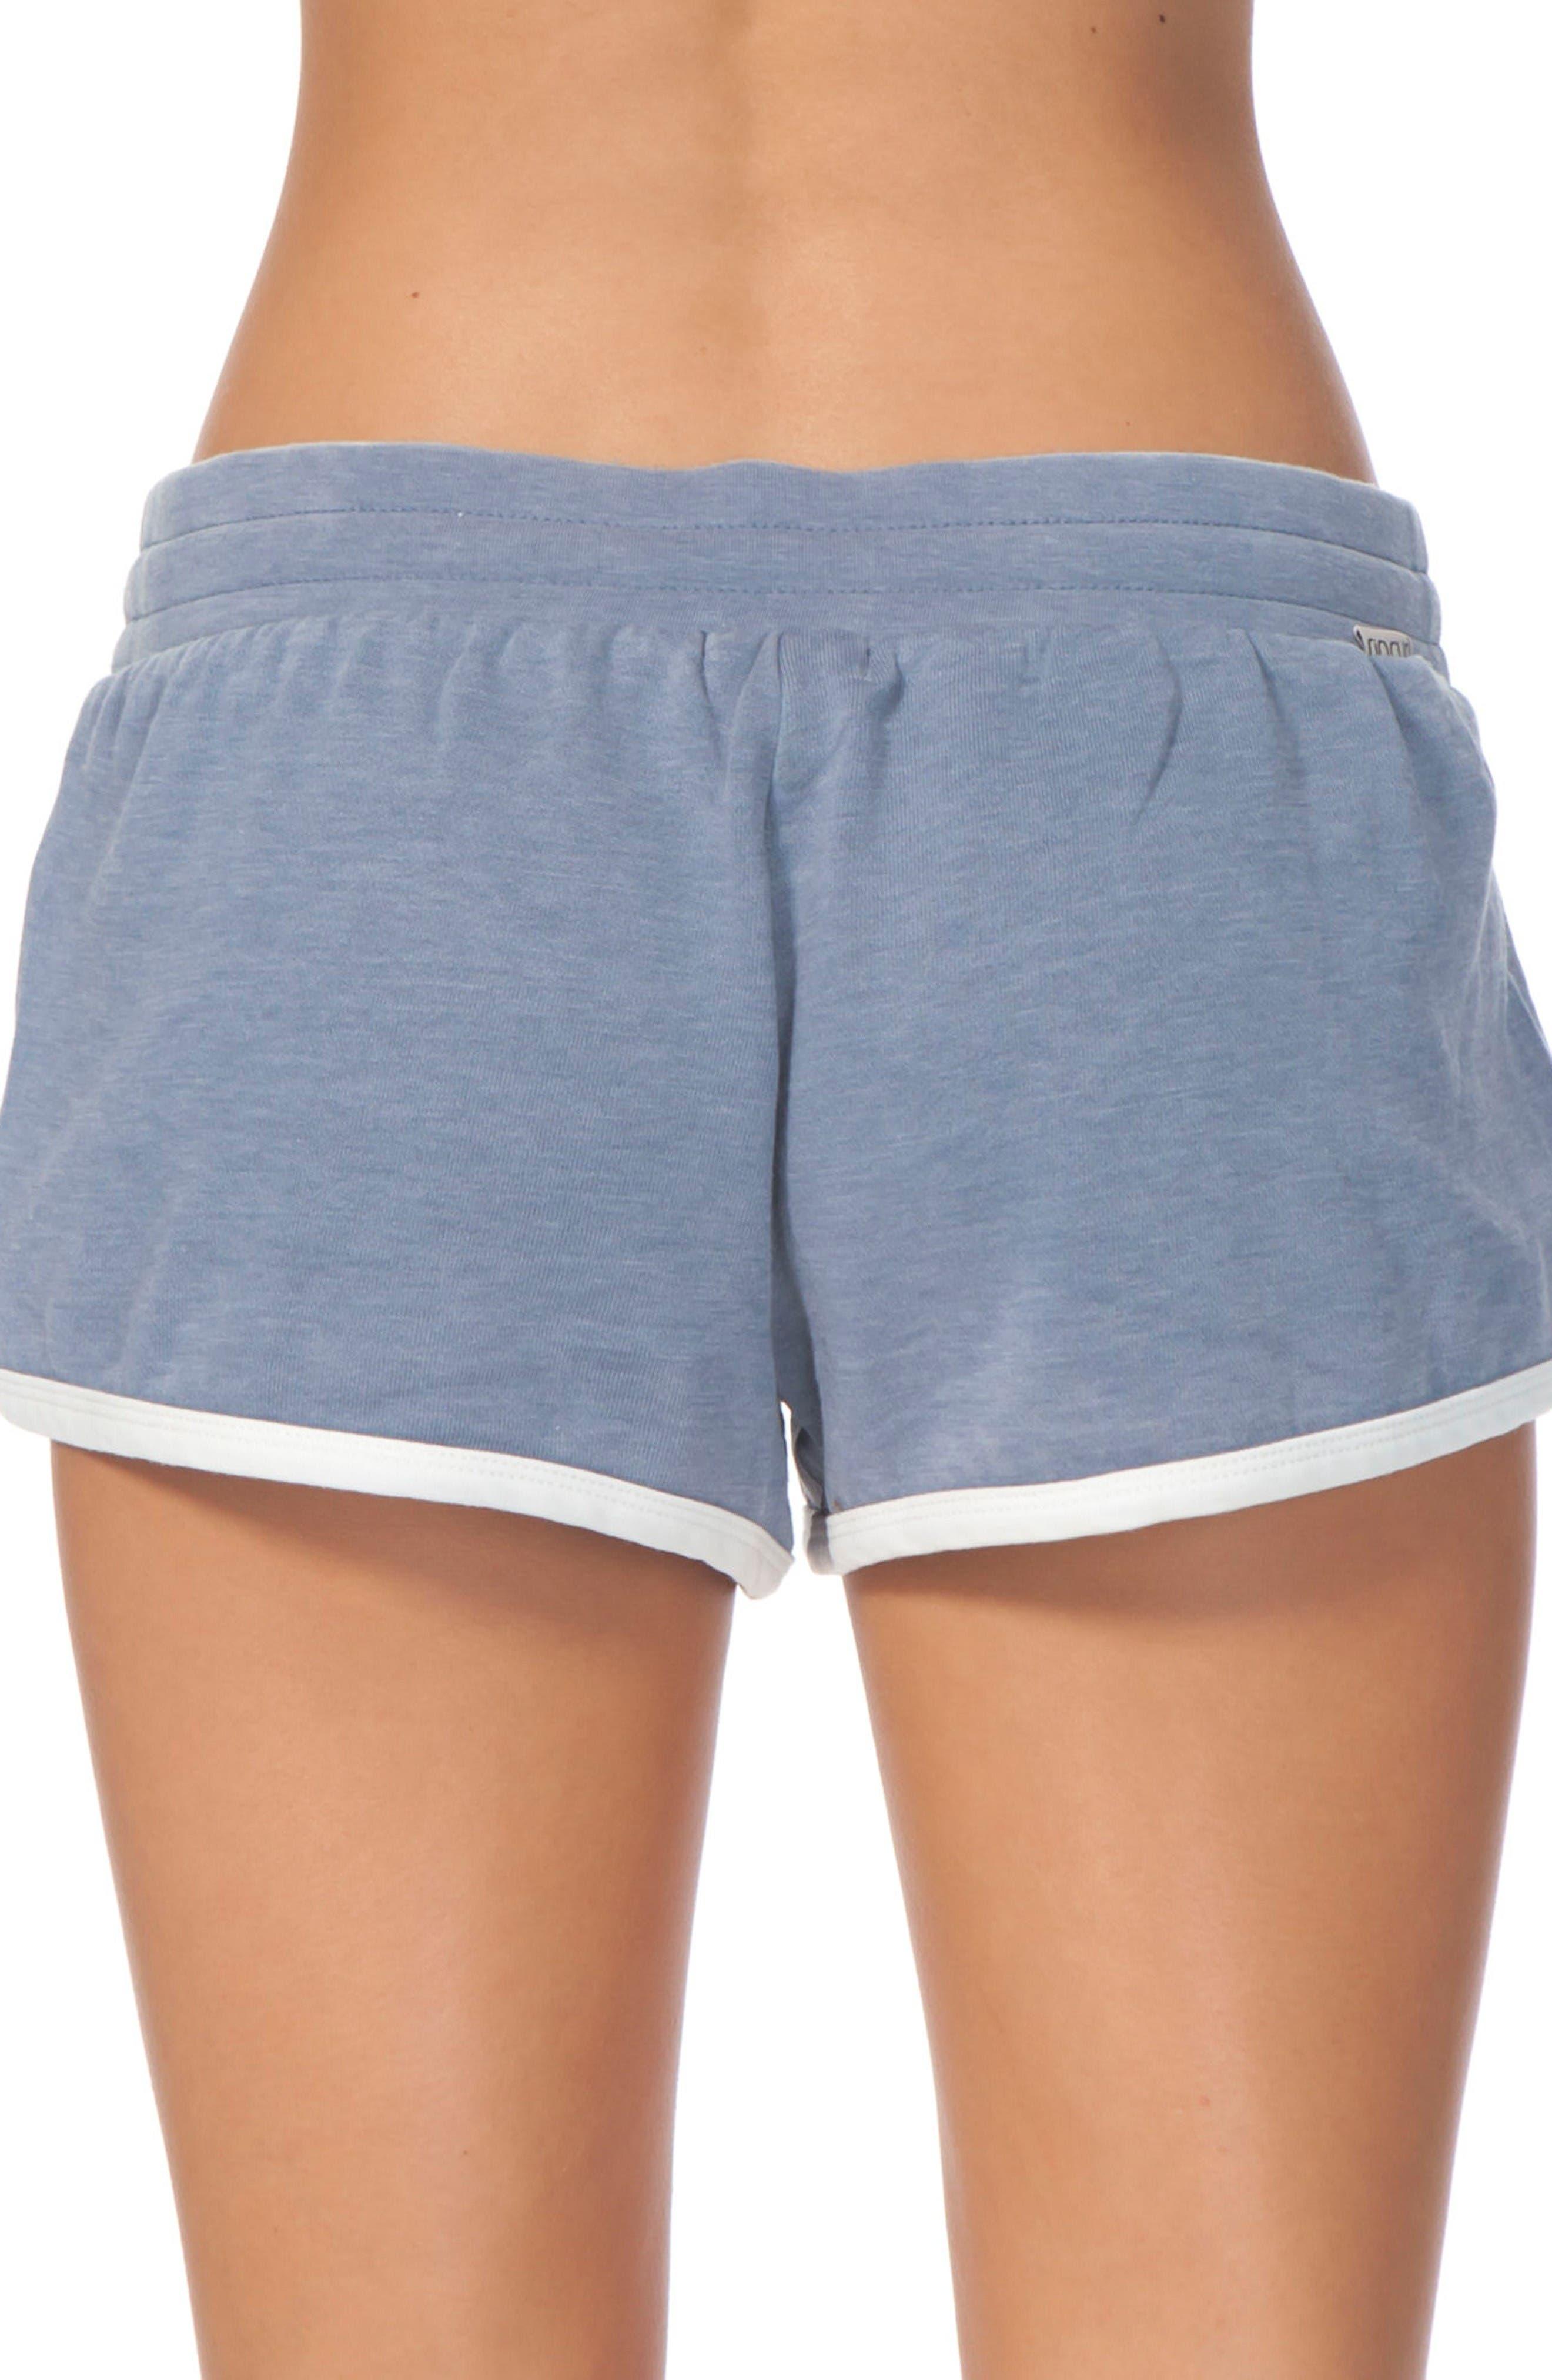 Alternate Image 3  - Rip Curl Palm Beach Shorts